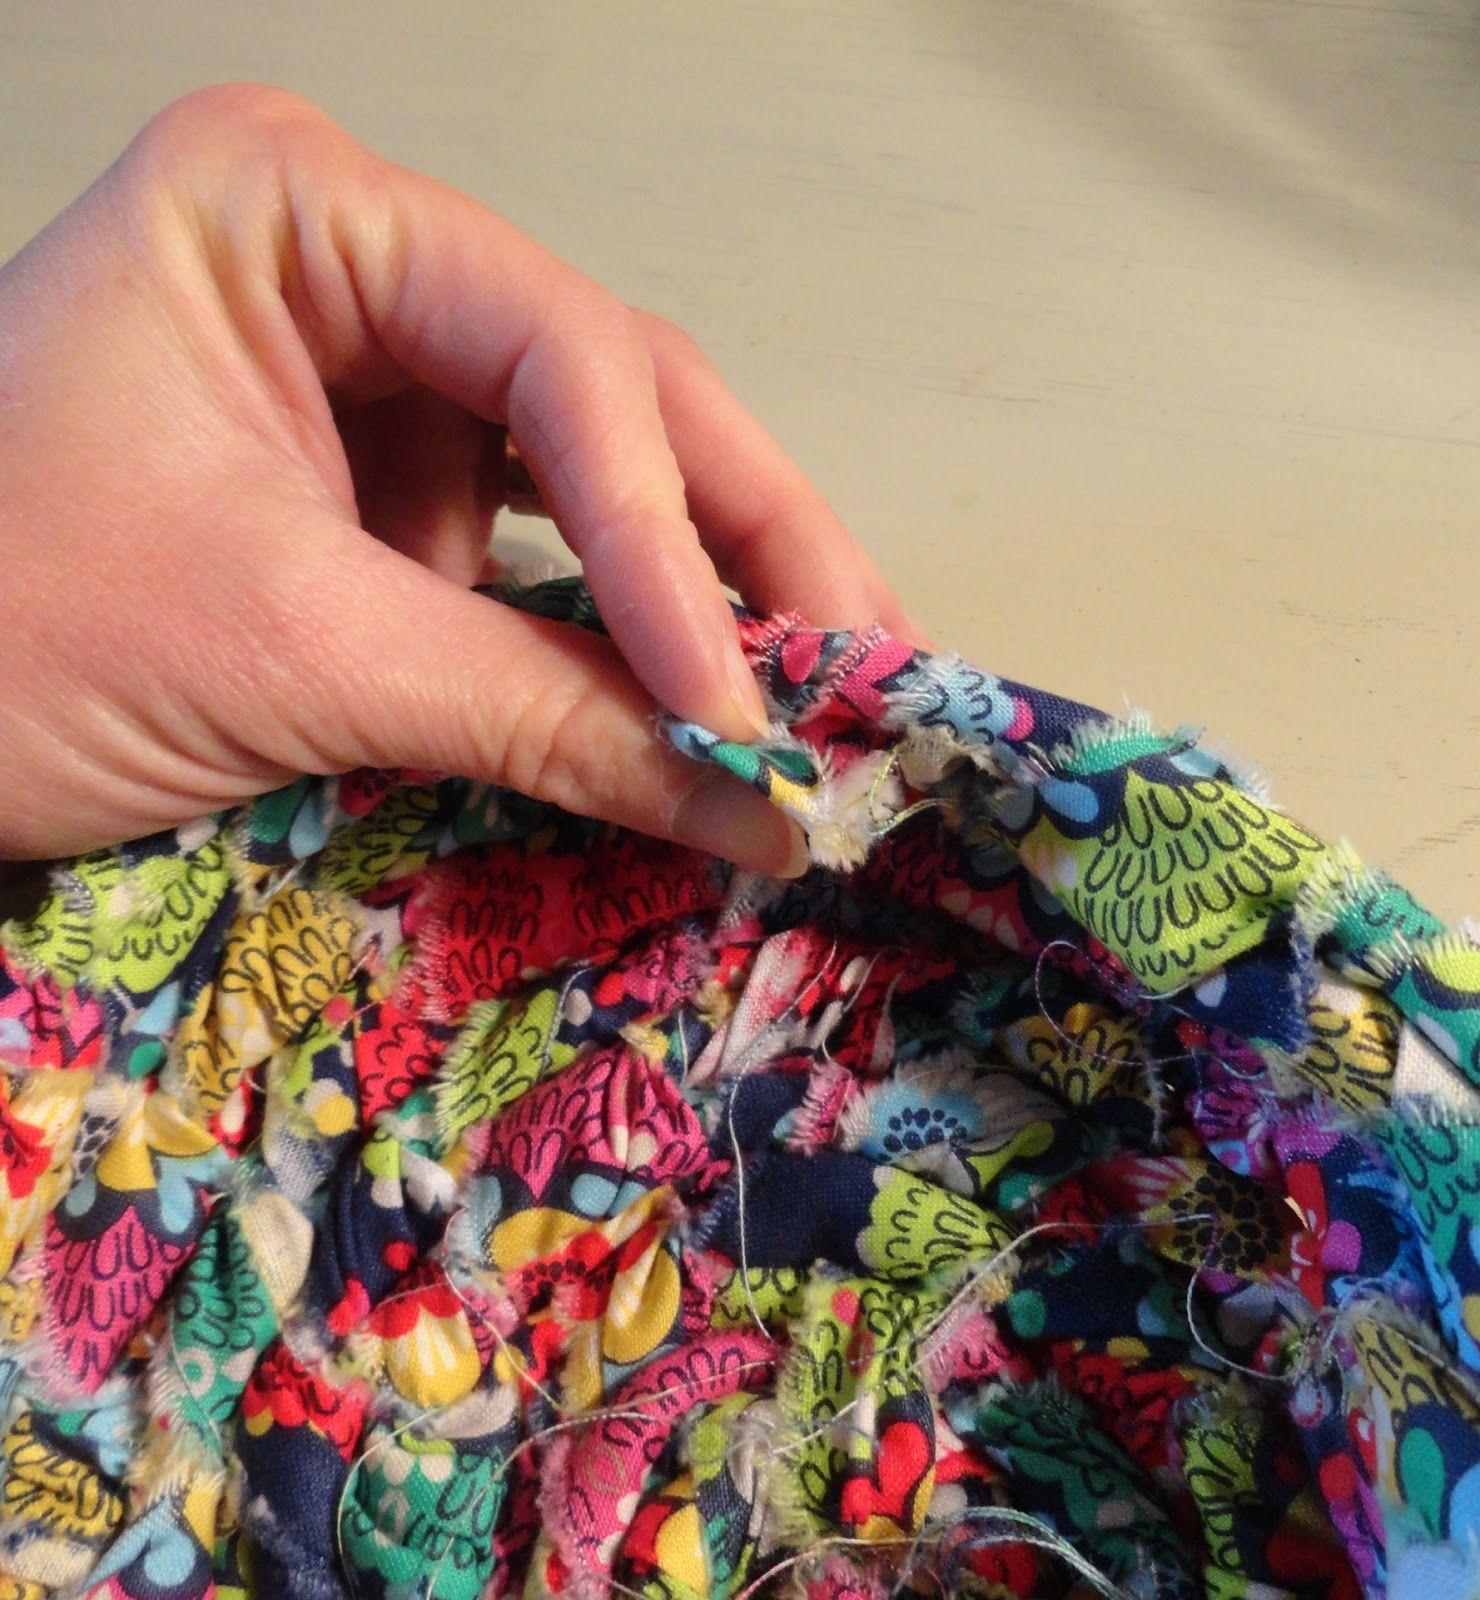 Holy Craft: Woven clothesline scrap fabric basket tutorial #scrapfabric